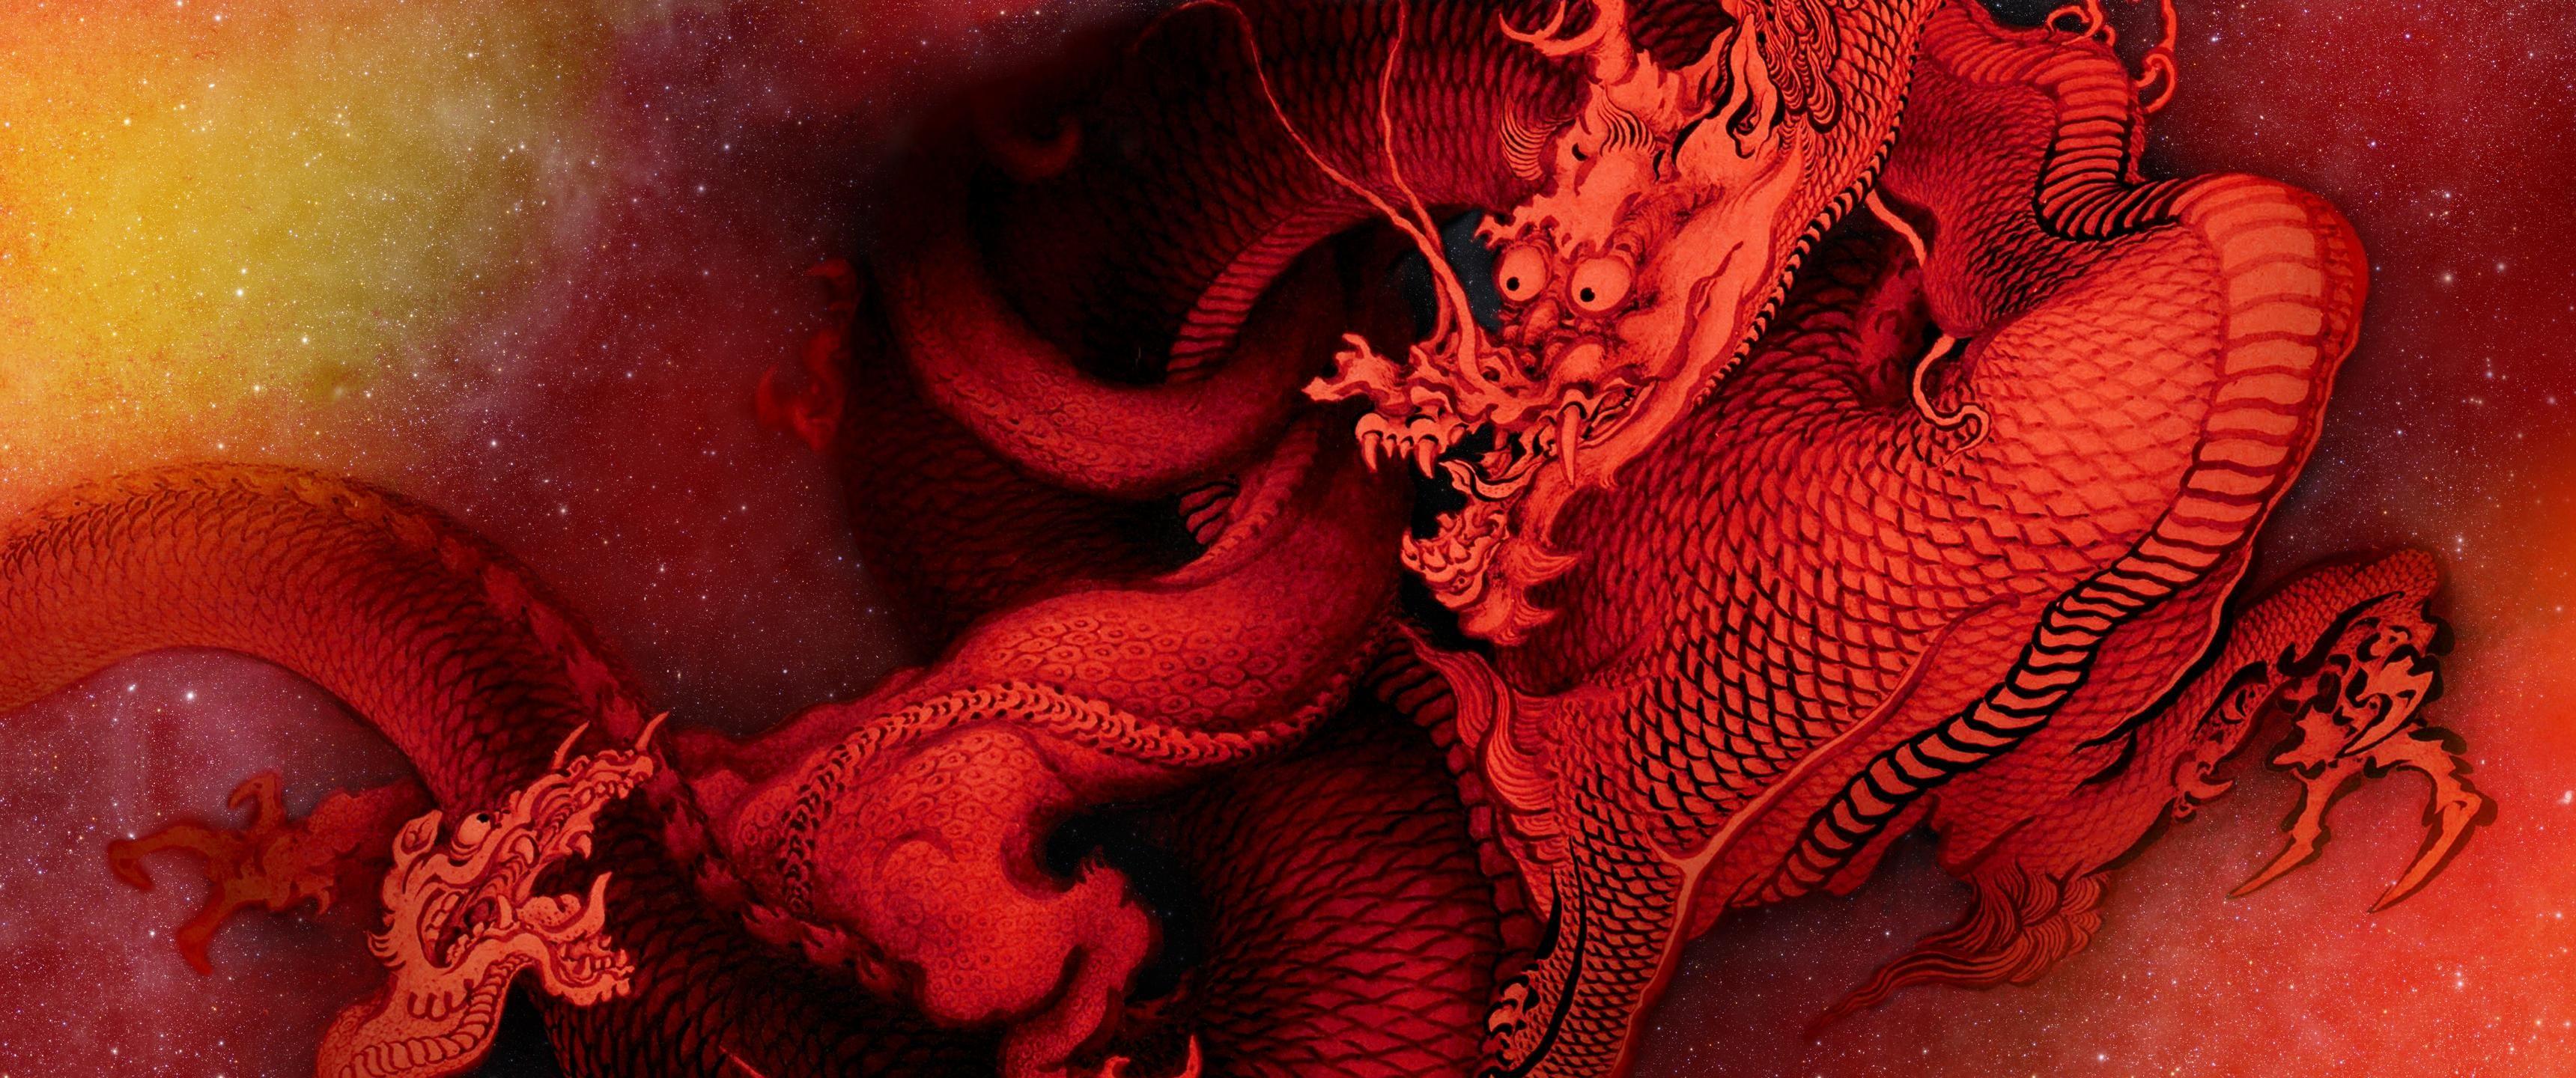 Red Dragon 3440x1440 Via Classy Bro 3440x1440 Wallpaper Warframe Wallpaper 4k Wallpaper For Mobile